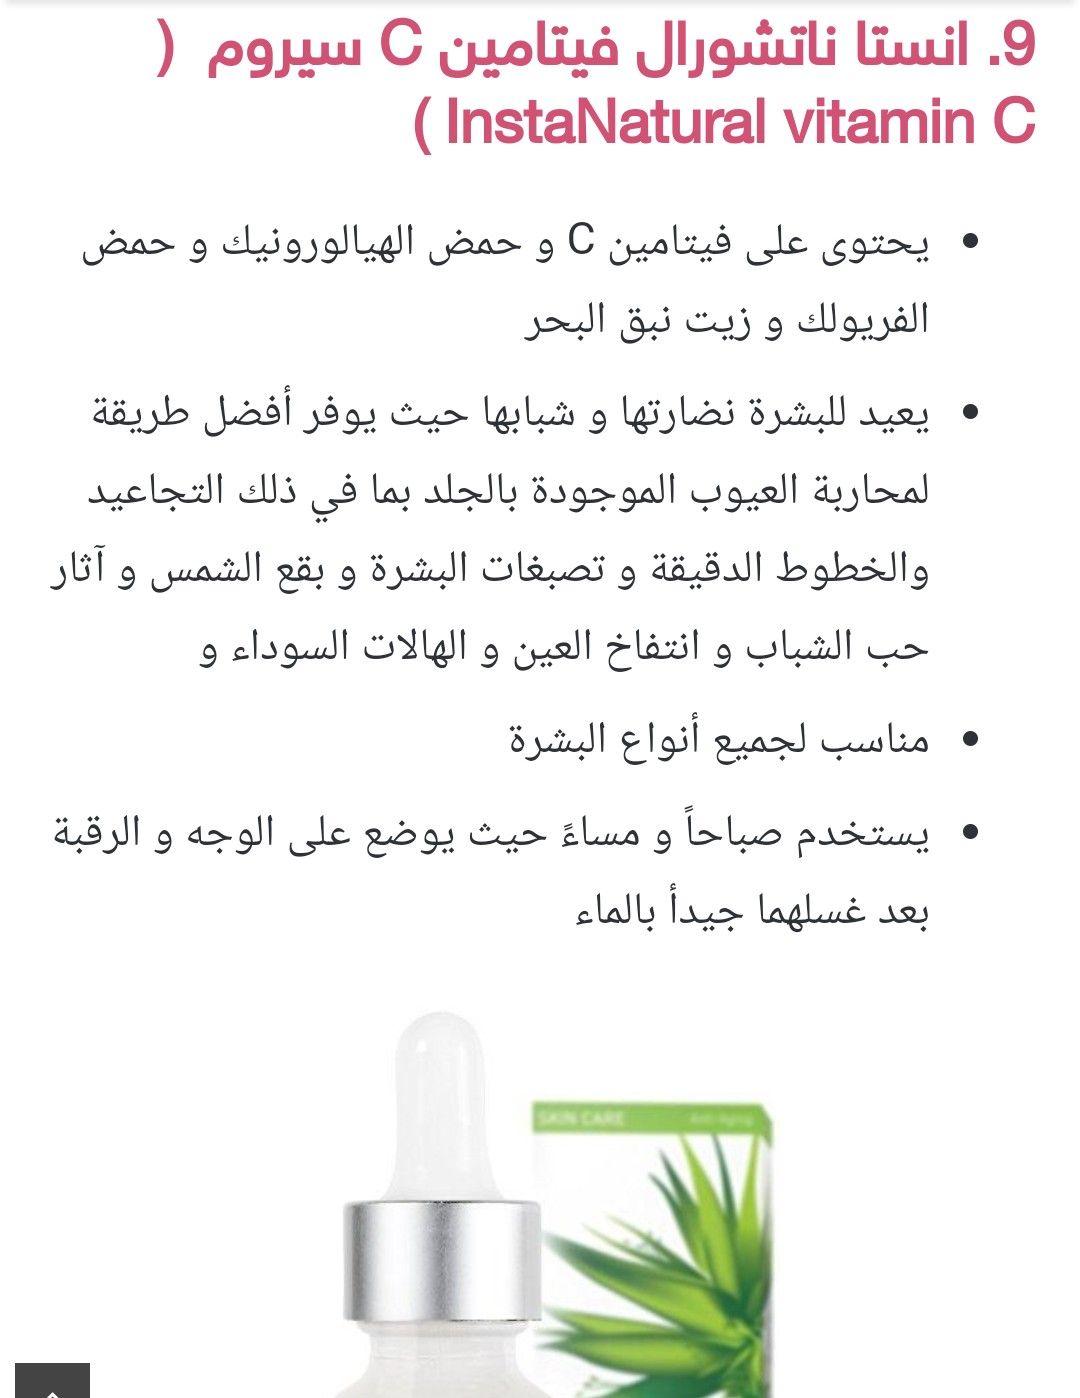 Pin By Zaaha 23 On علاج مشاكل الوجة Vitamins Vitamin C